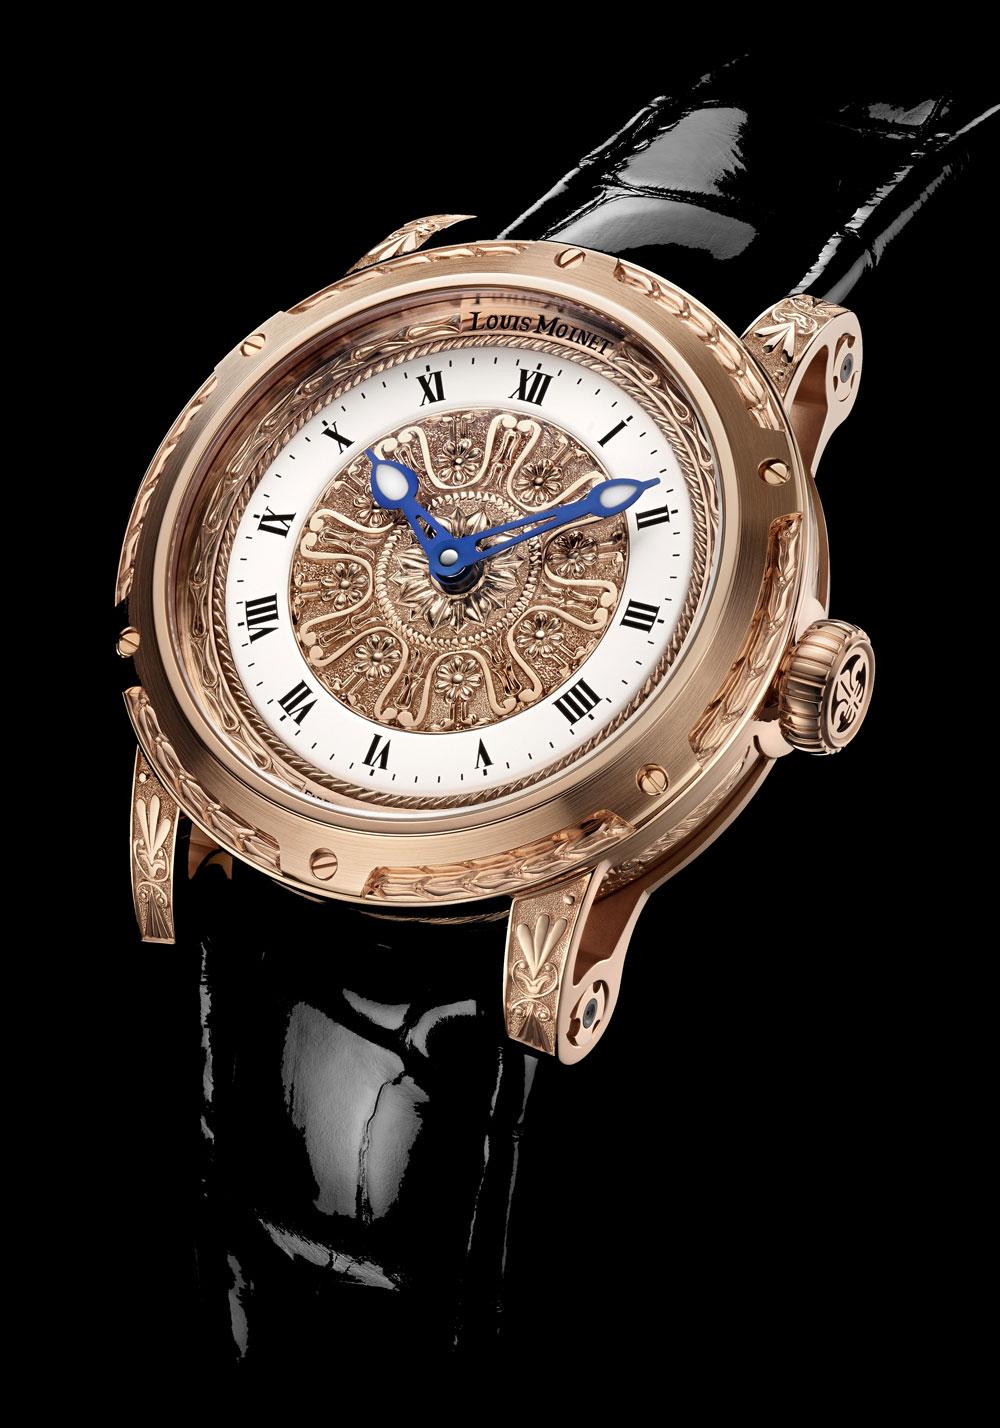 Reloj Russian Saga de Louis Moinet